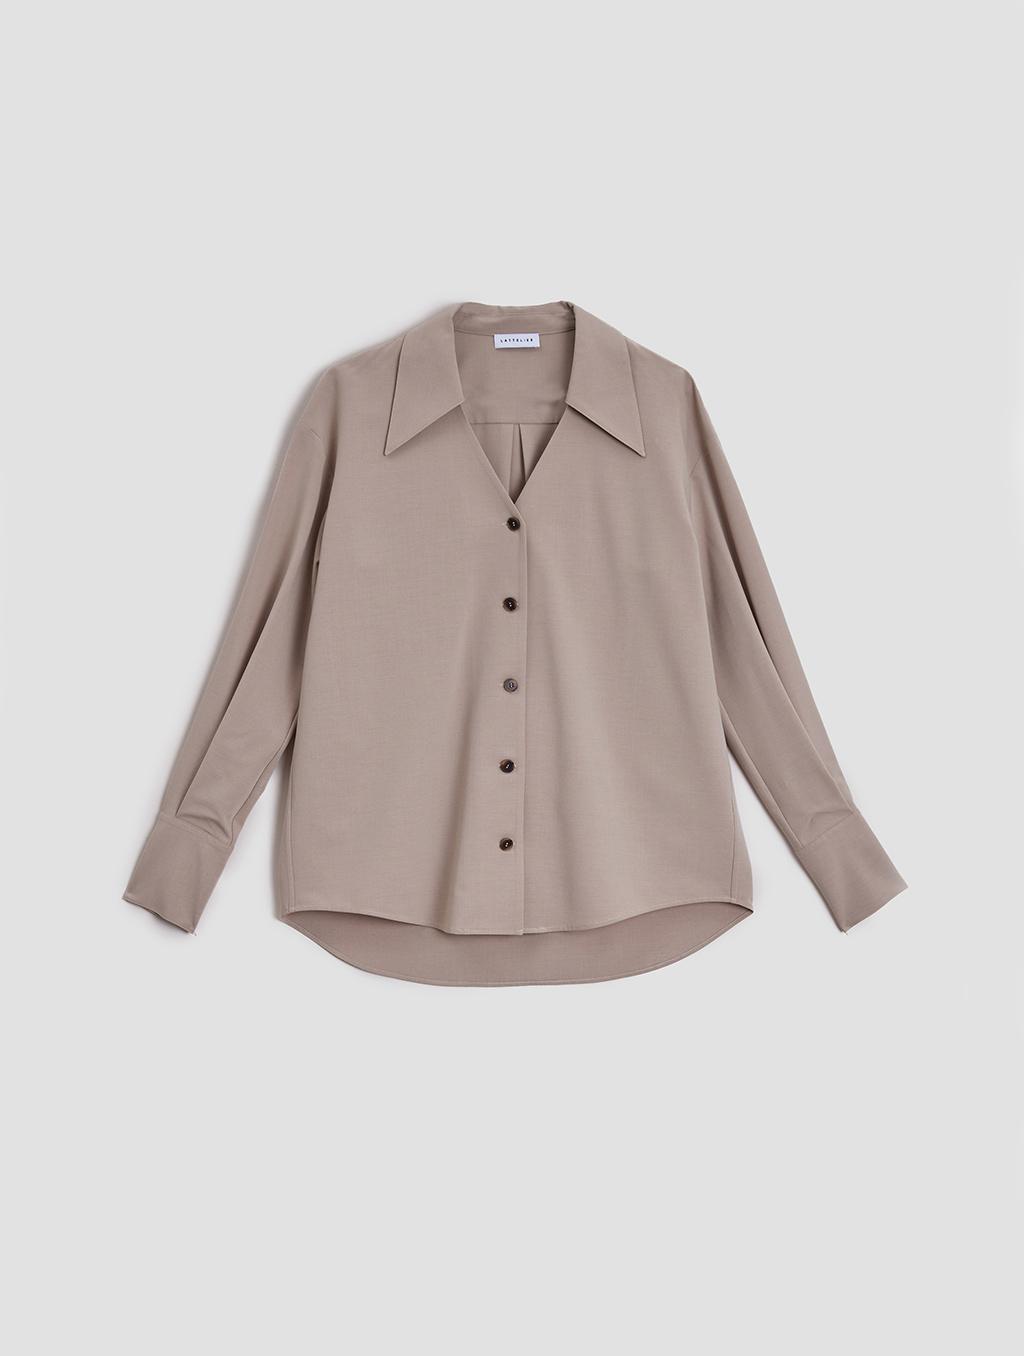 buttoned lantern sleeve shirt- Tiled-Light Taupe